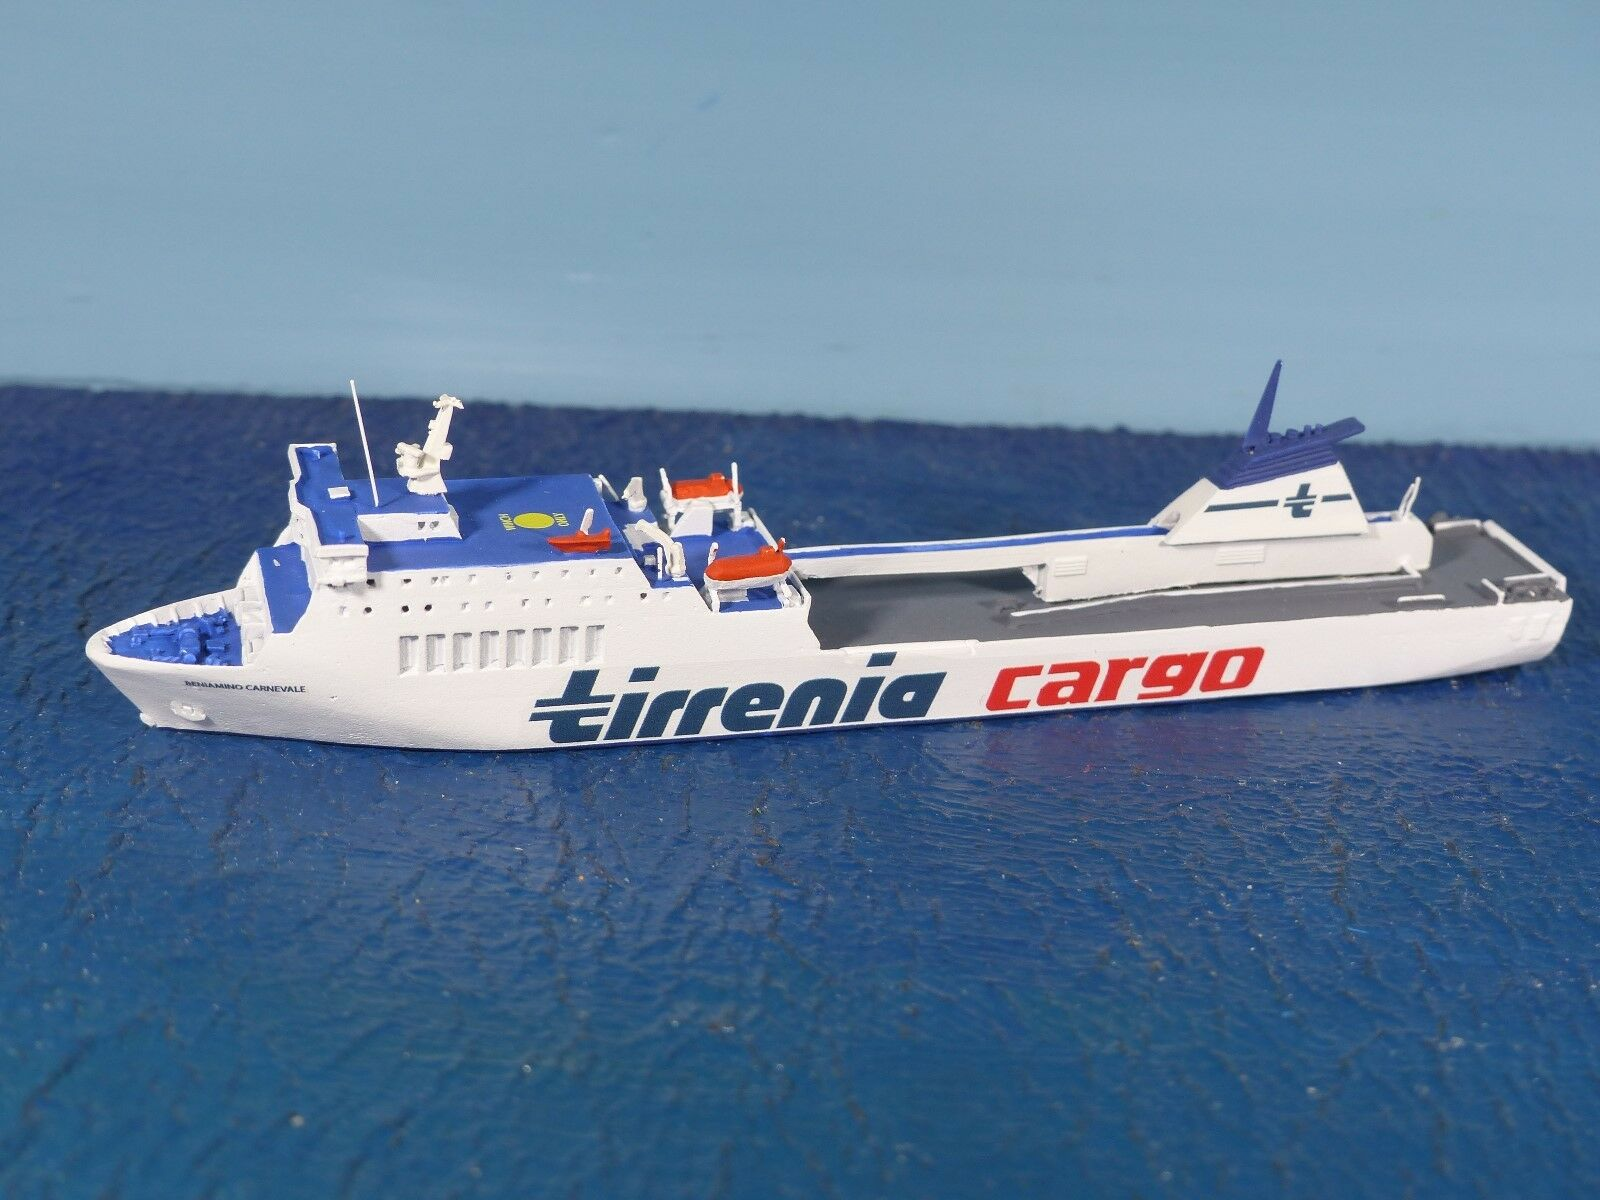 Mare Nostrum navire 1 1250 comité exécutif. De Ferry  Benjamino Carnevale  MN 15 B neuf dans sa boîte